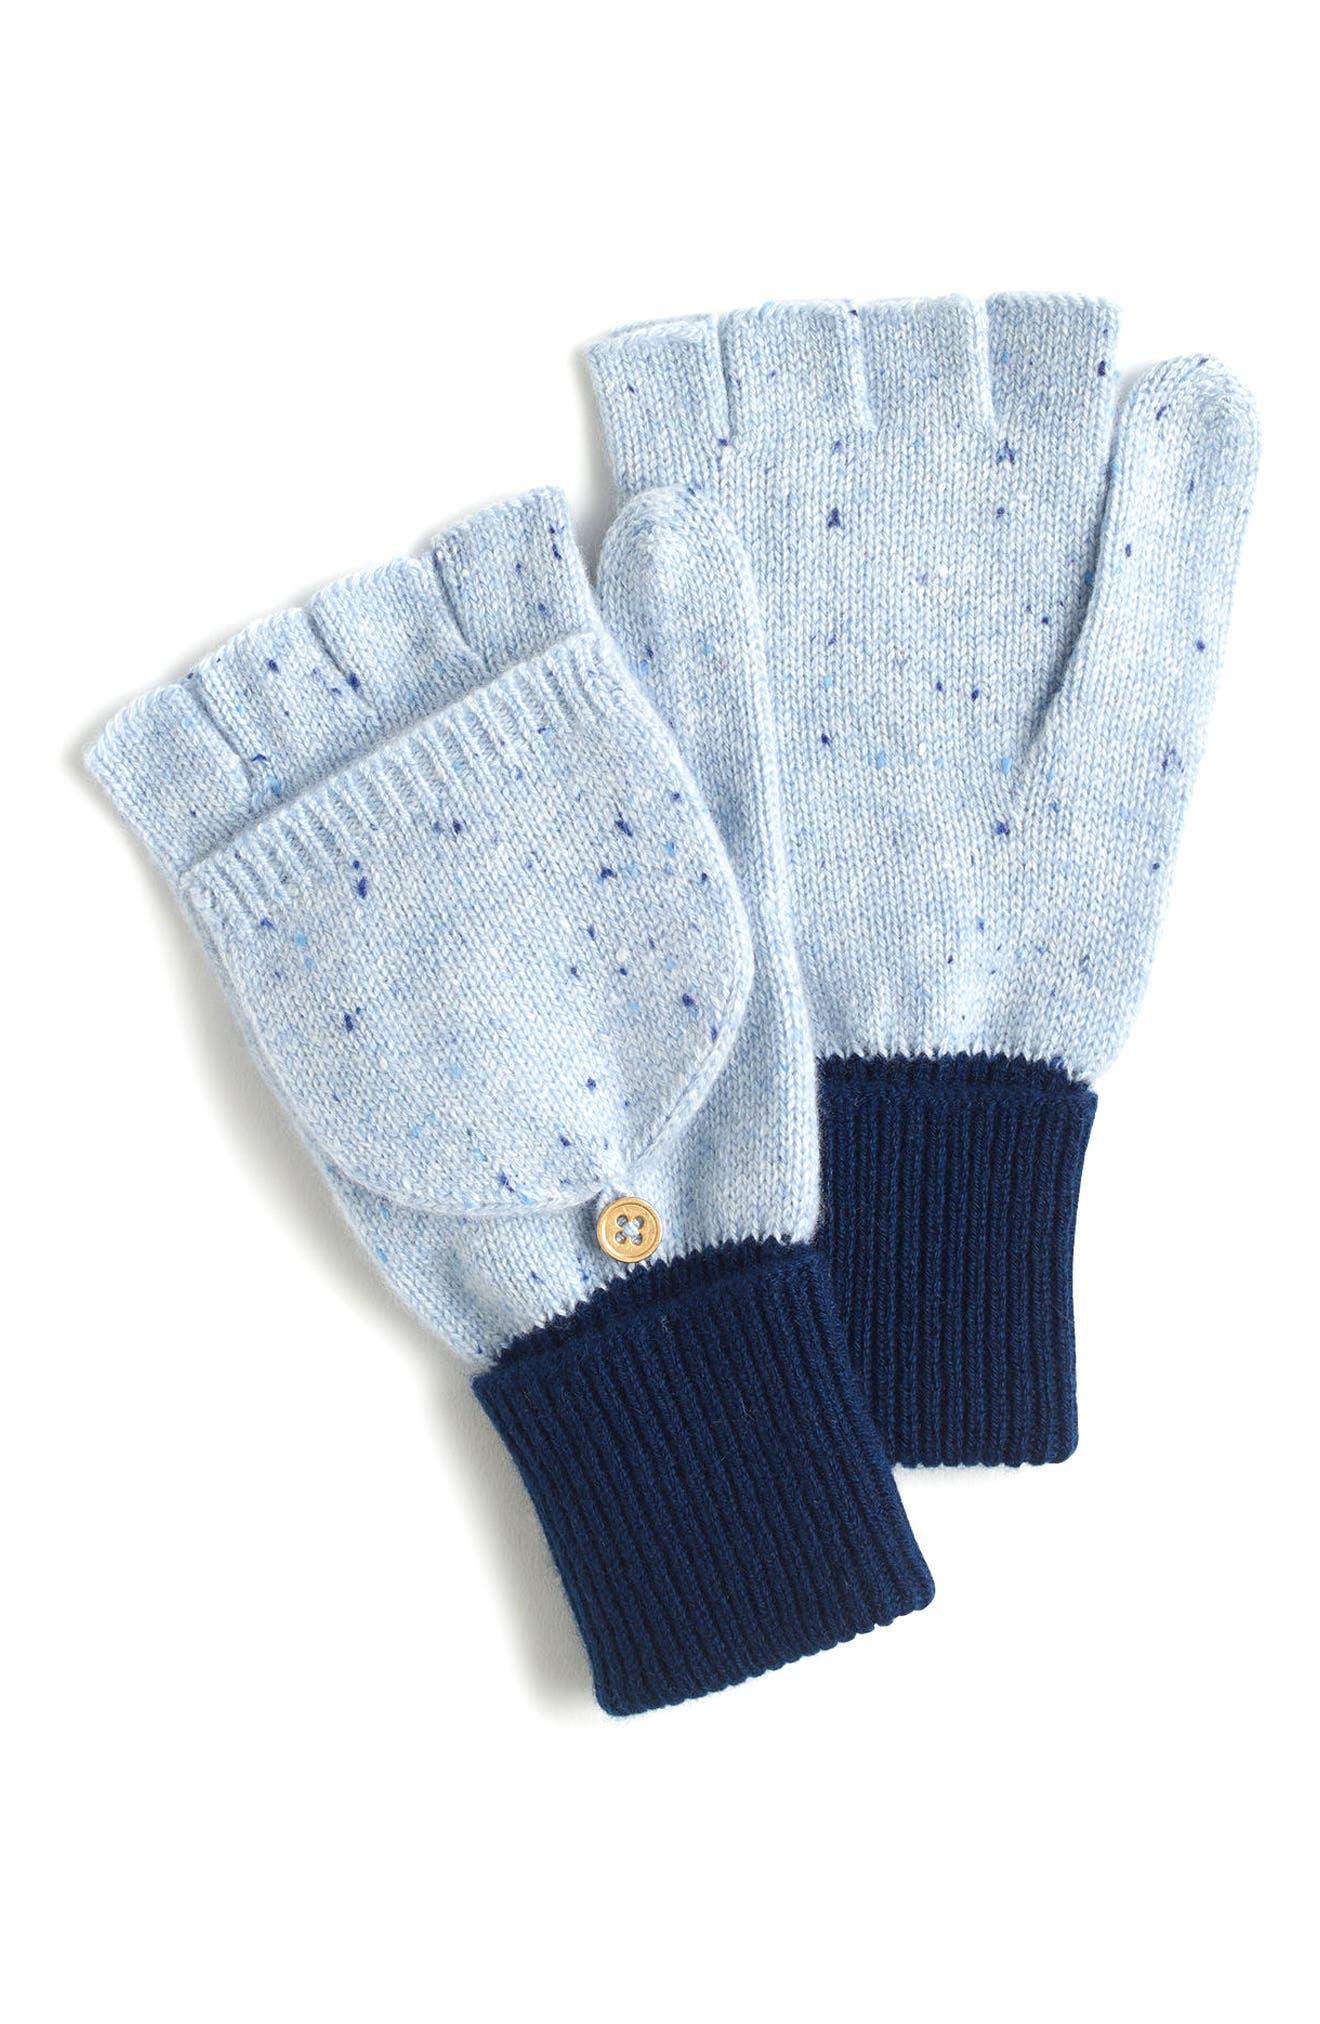 Glitten Cashmere Gloves,                             Main thumbnail 1, color,                             403